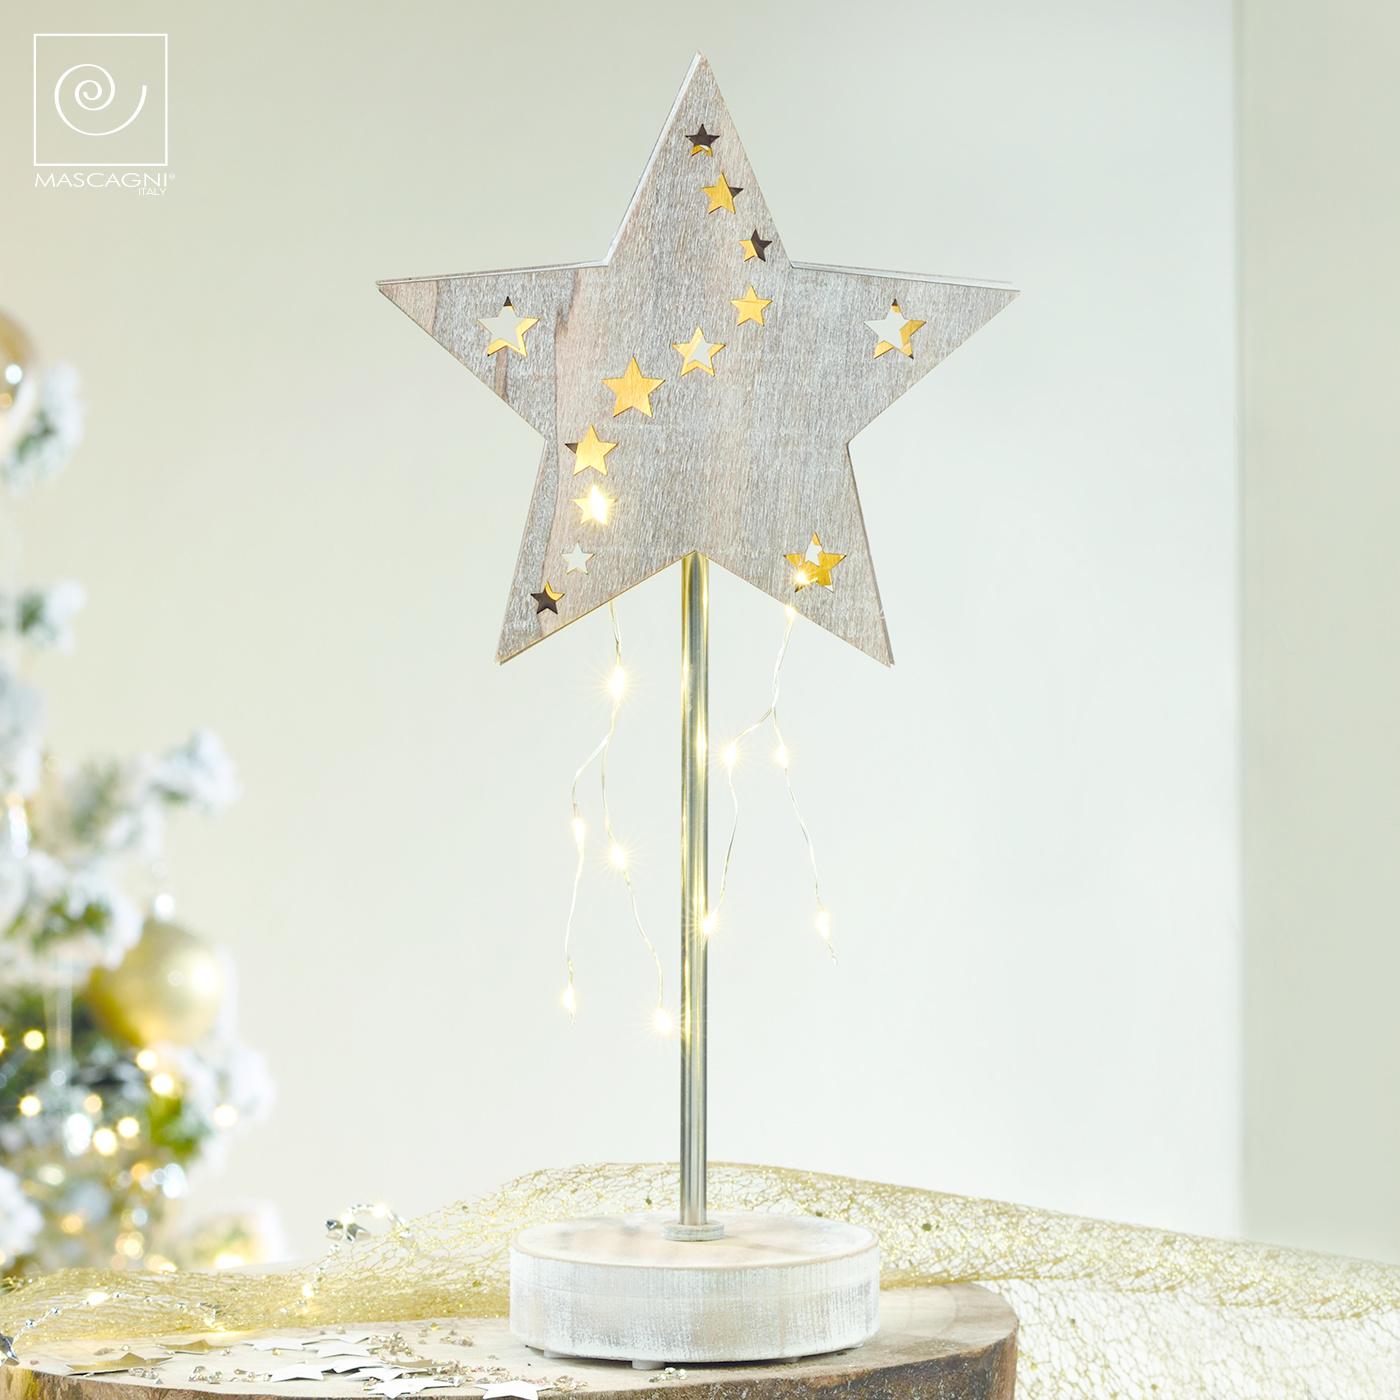 Art Mascagni LED STAR CM.36